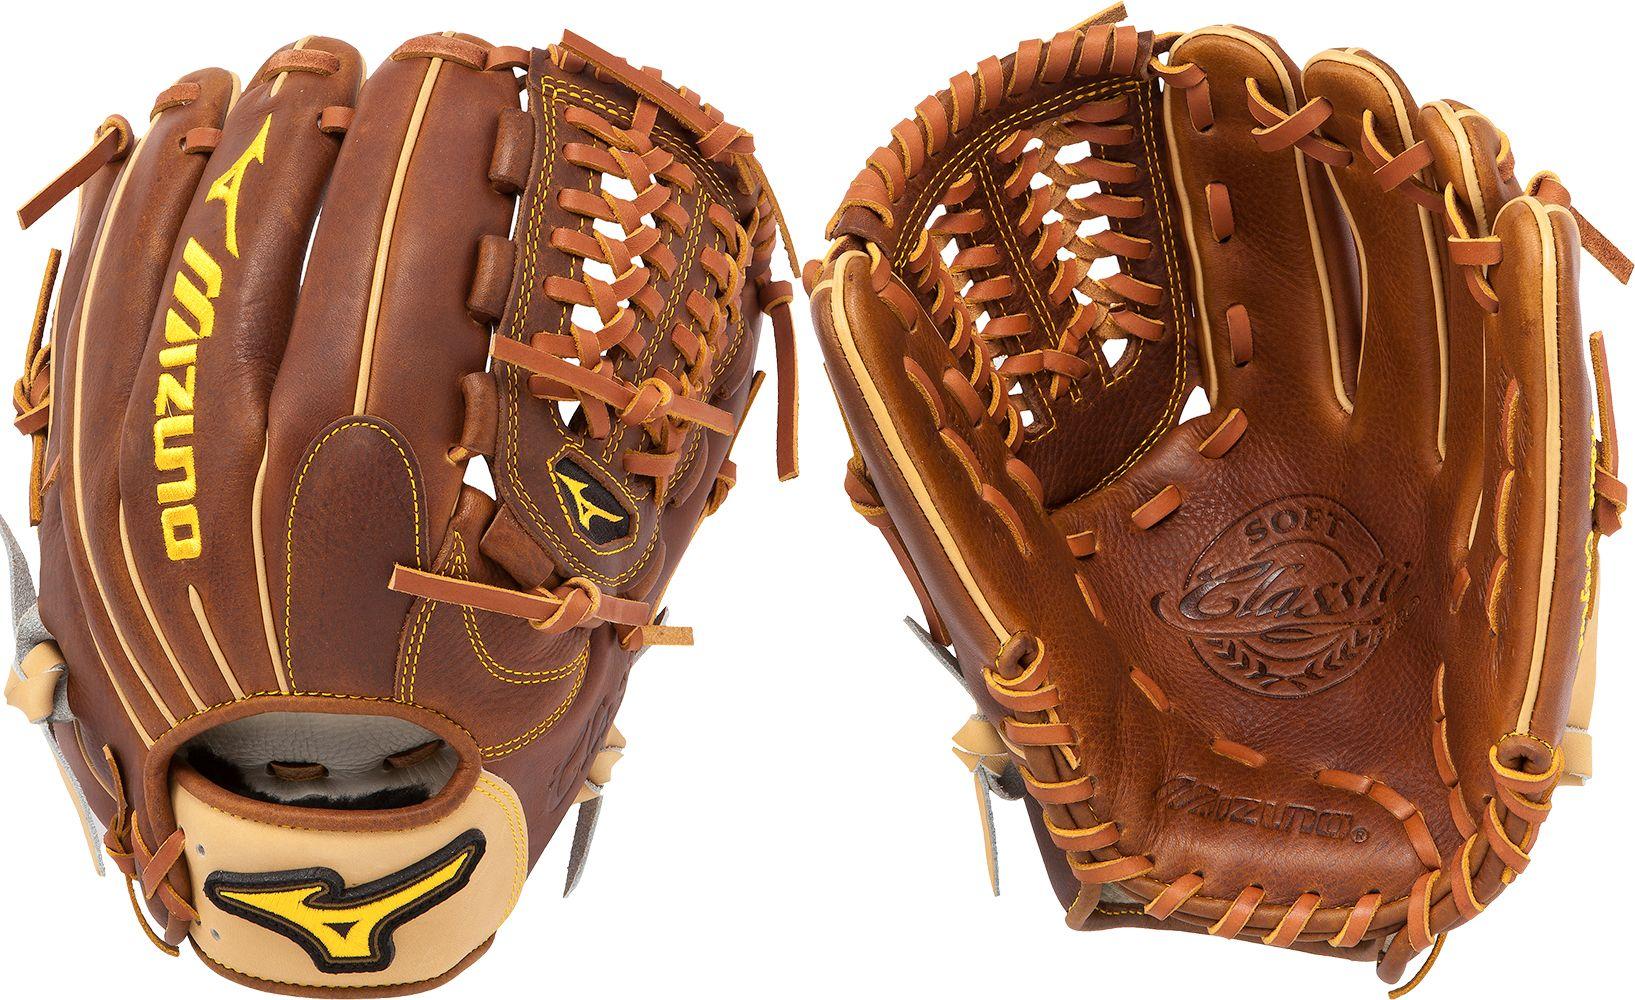 mizuno baseball gloves mizuno 11.5 PCRCZEX